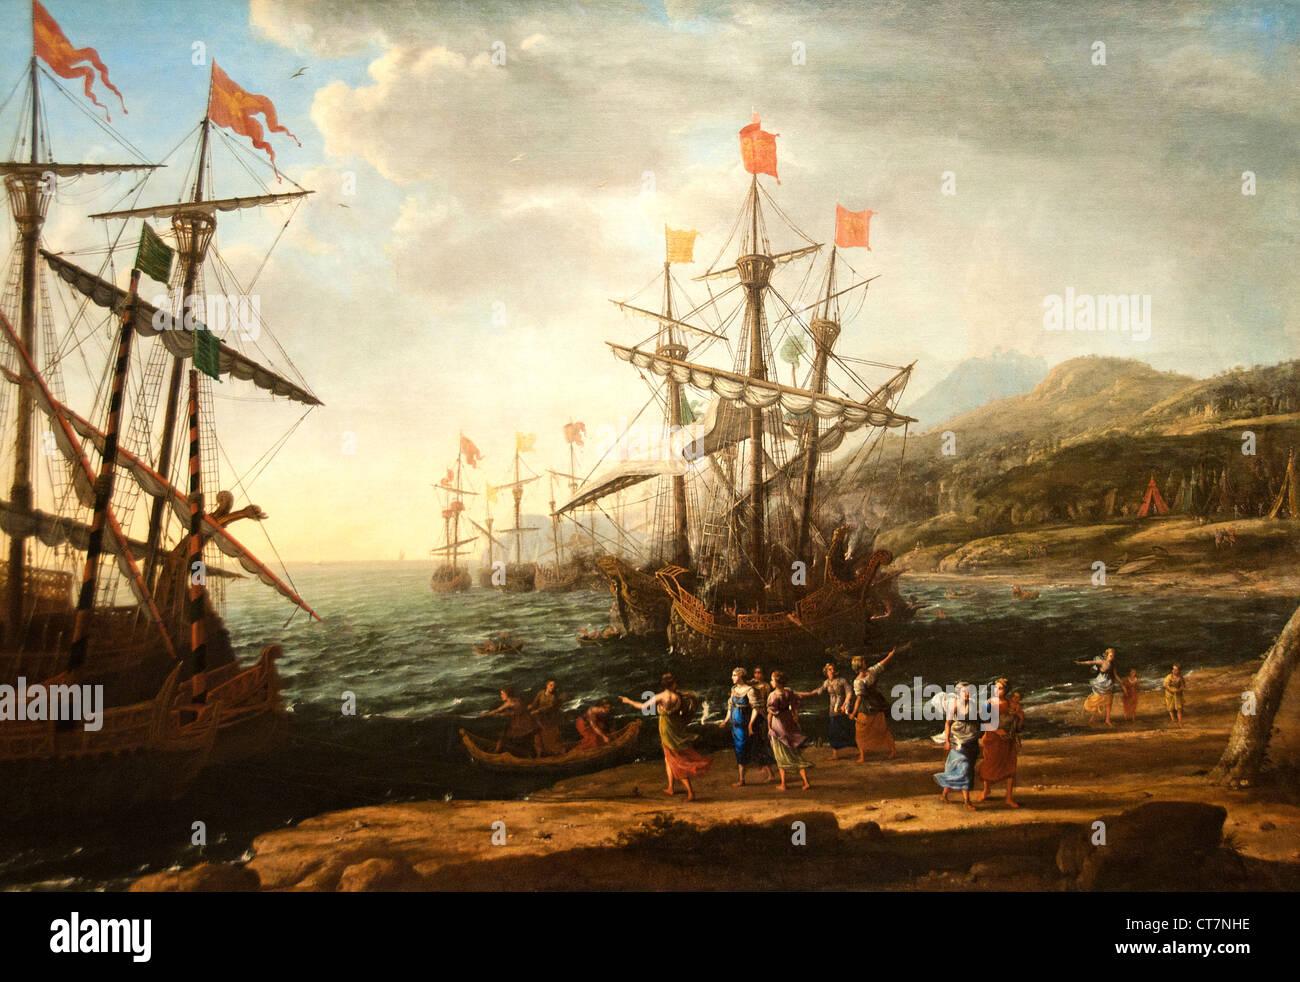 The Trojan Women Setting Fire to Their Fleet 1643   Claude Lorrain - Claude Gellée 1604/1605–1682)   France - Stock Image